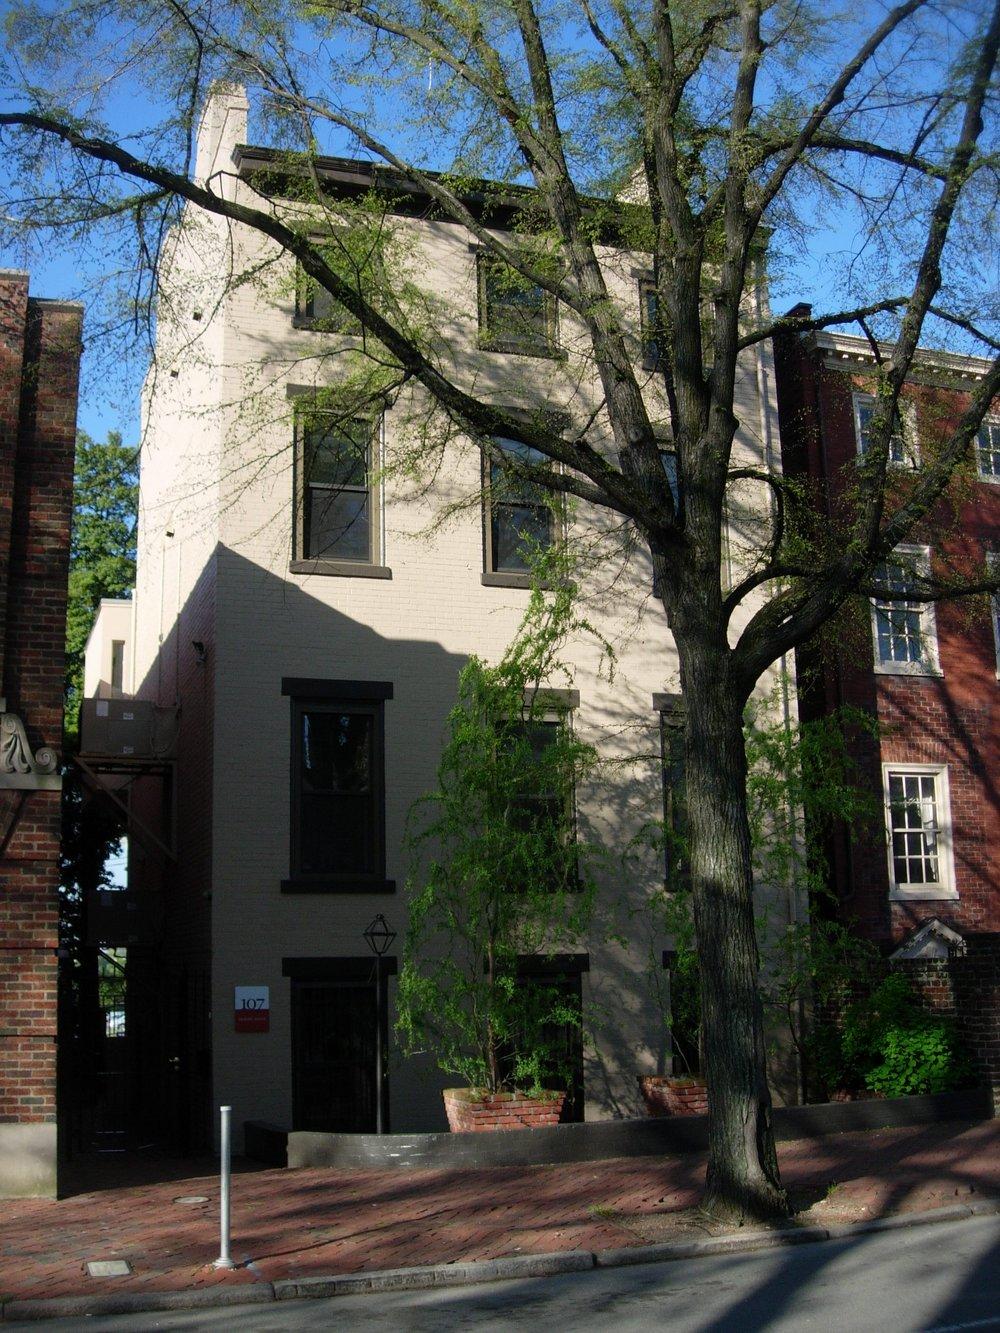 FORInstance Gallery + Studio, 107 E. Cary Street, Richmond, Virginia